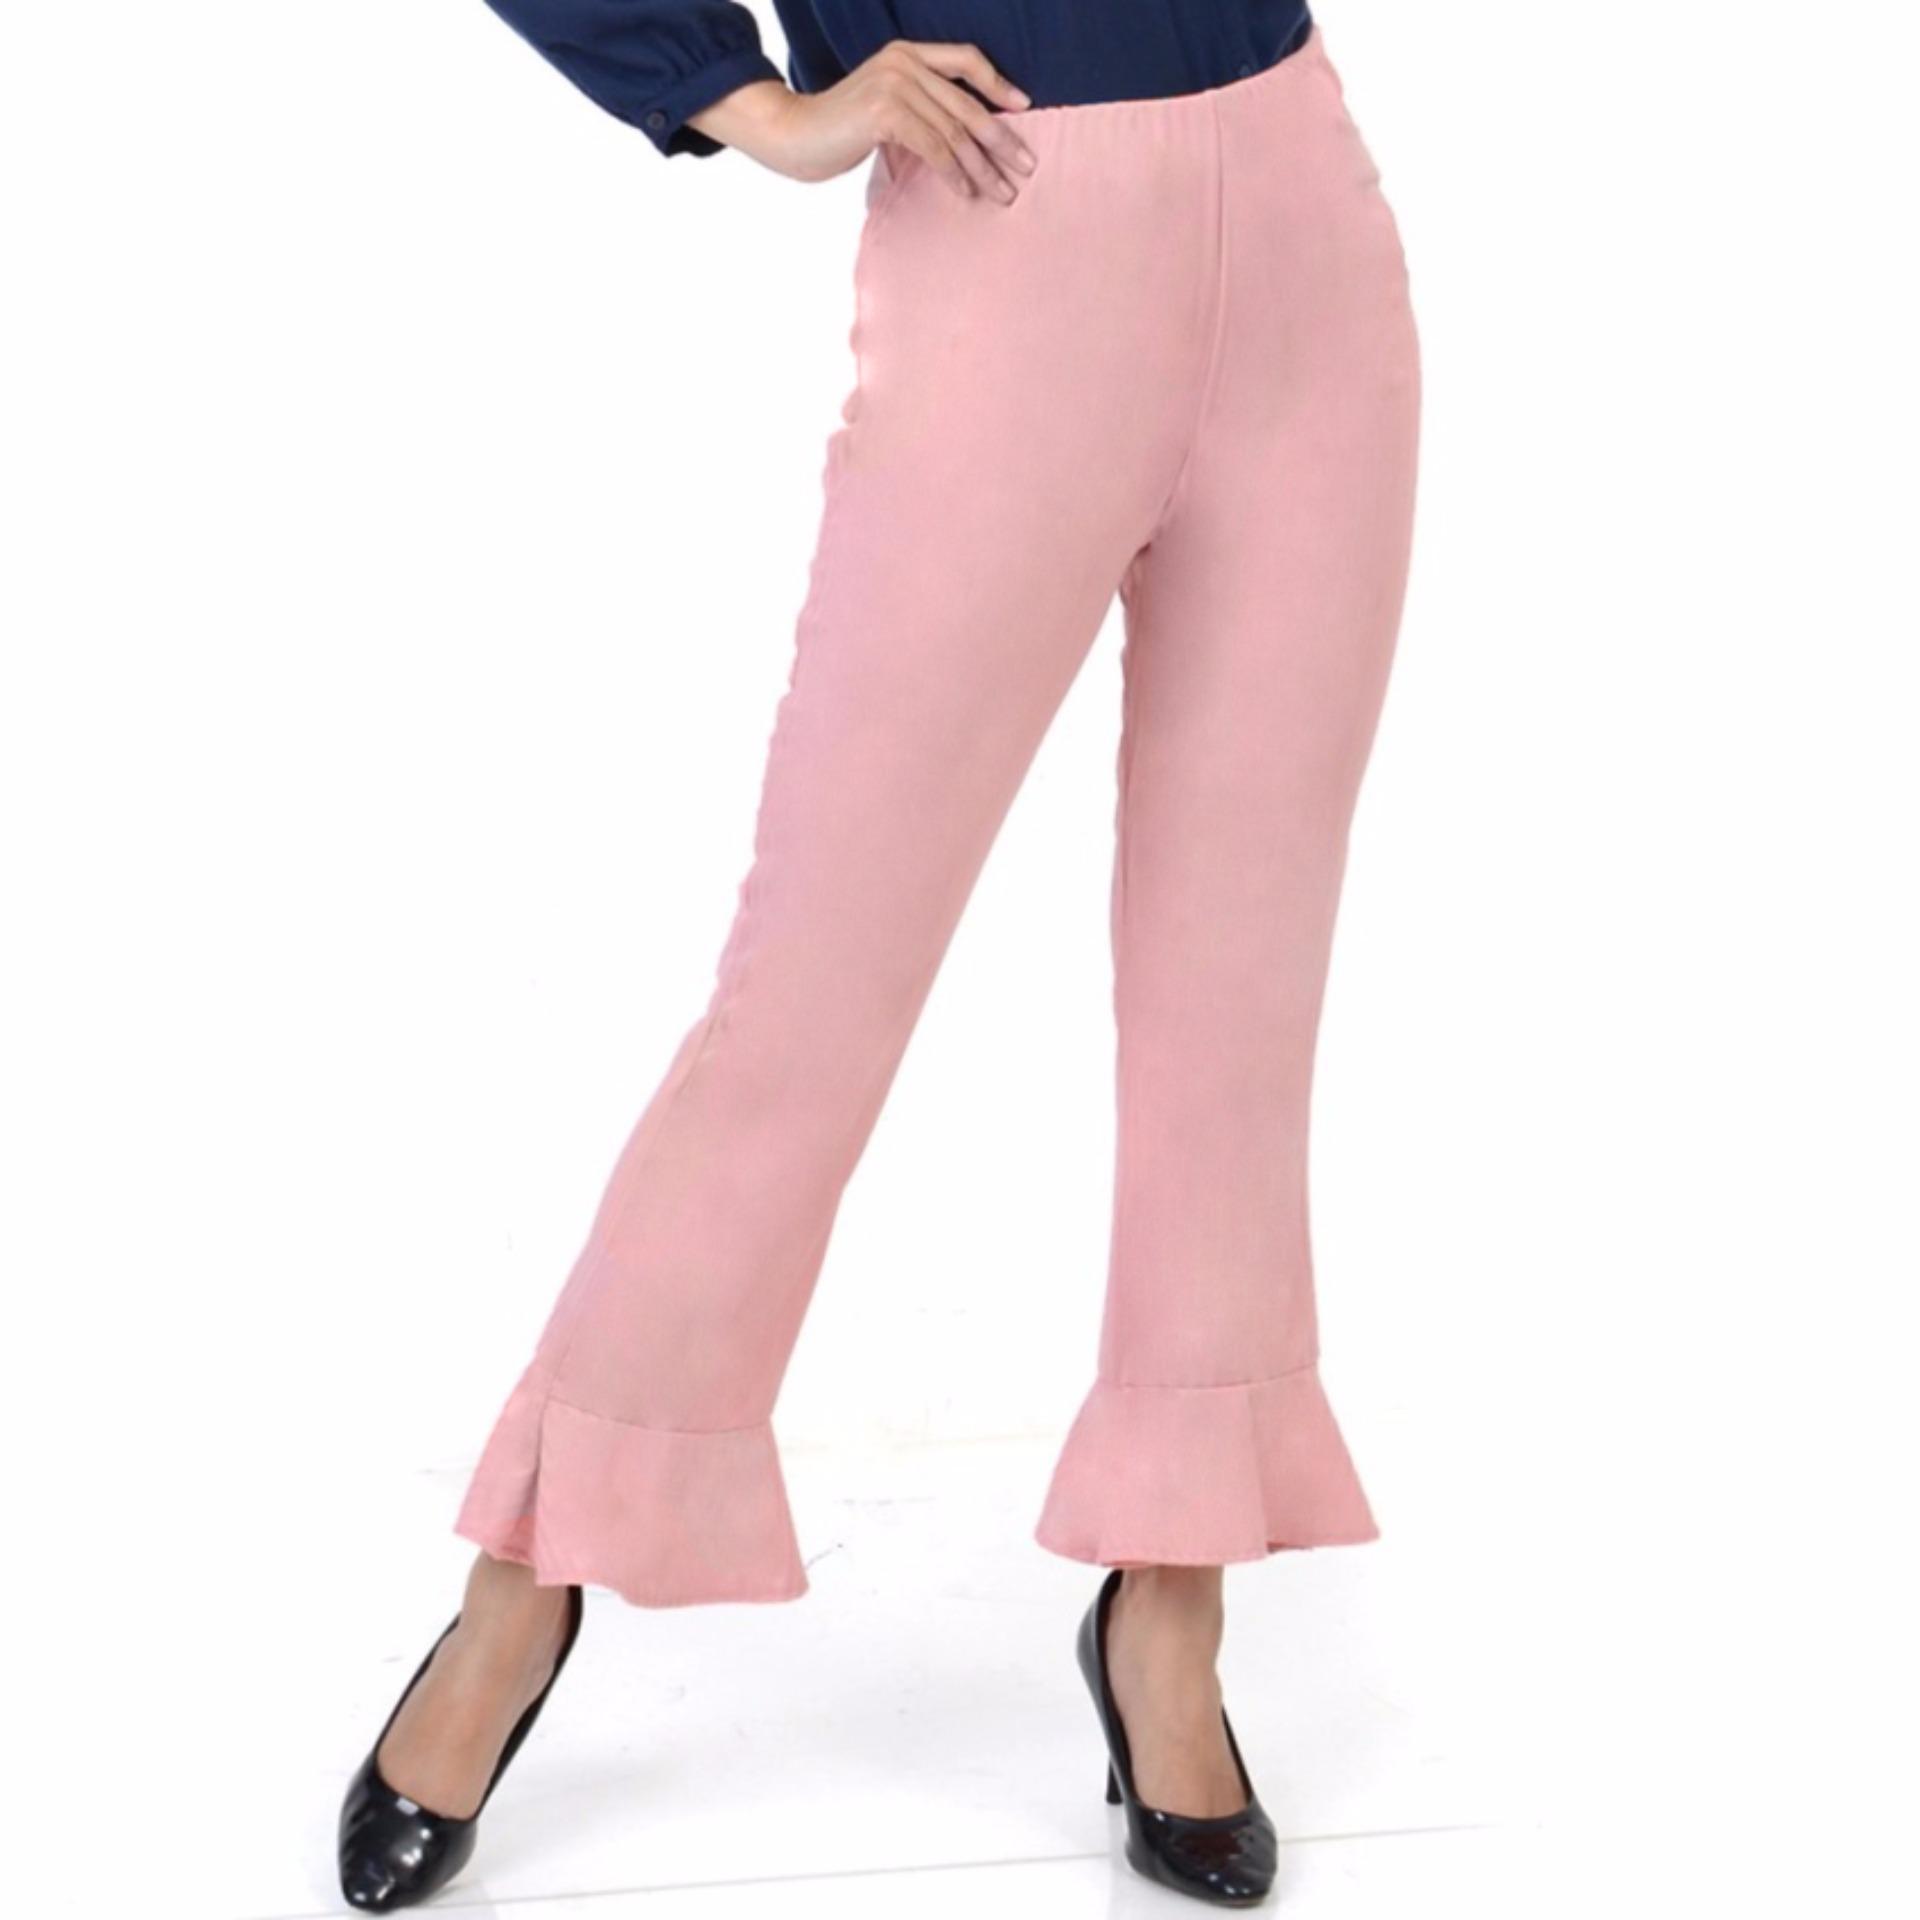 Ace Fashion Axel Cullote Pants Celana Kulot Wanita Pink Daftar Midi Nda Fjn822b